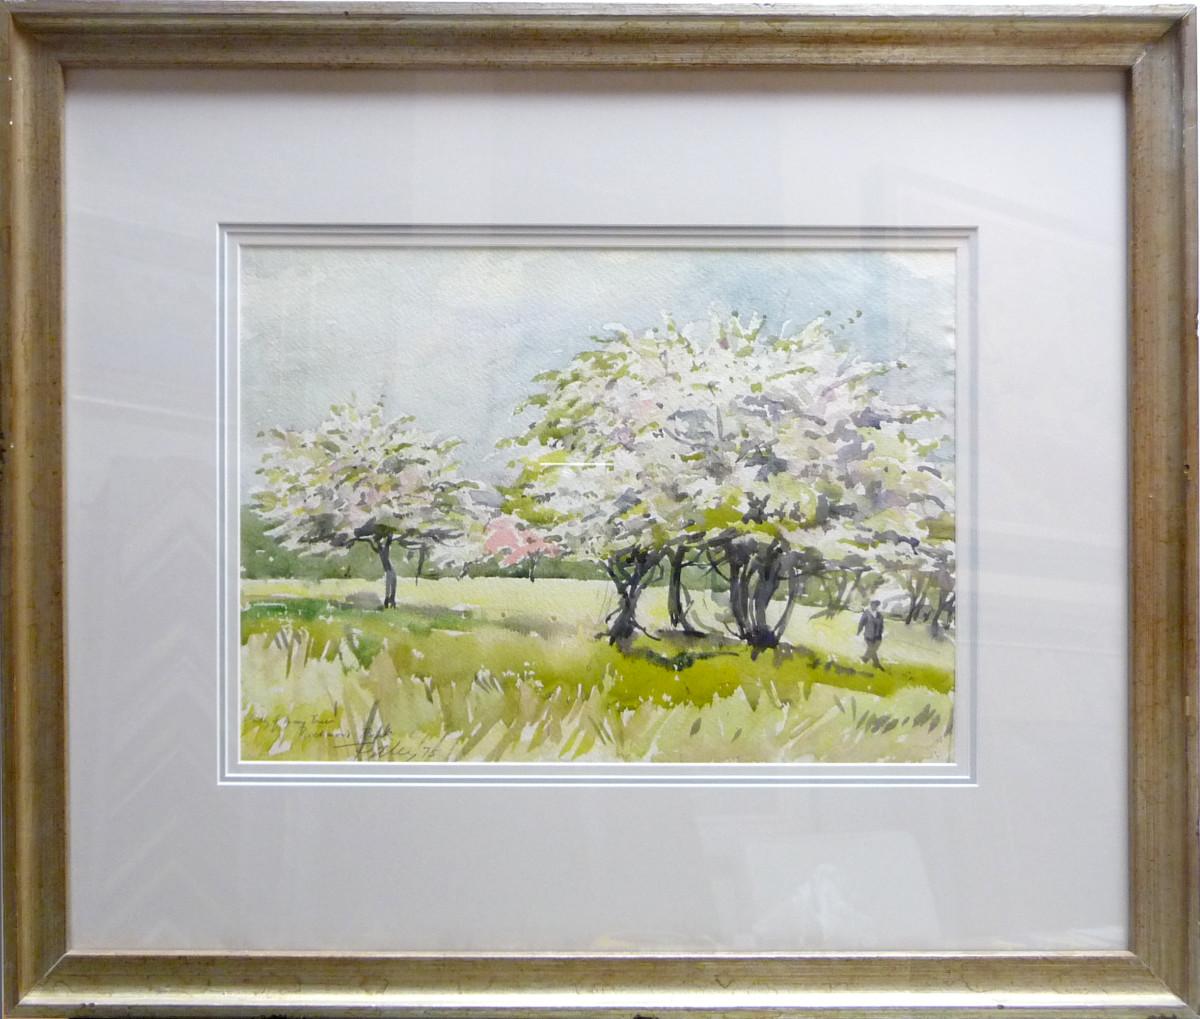 2358 - Study of May Trees, Richmond Park by Llewellyn Petley-Jones (1908-1986)